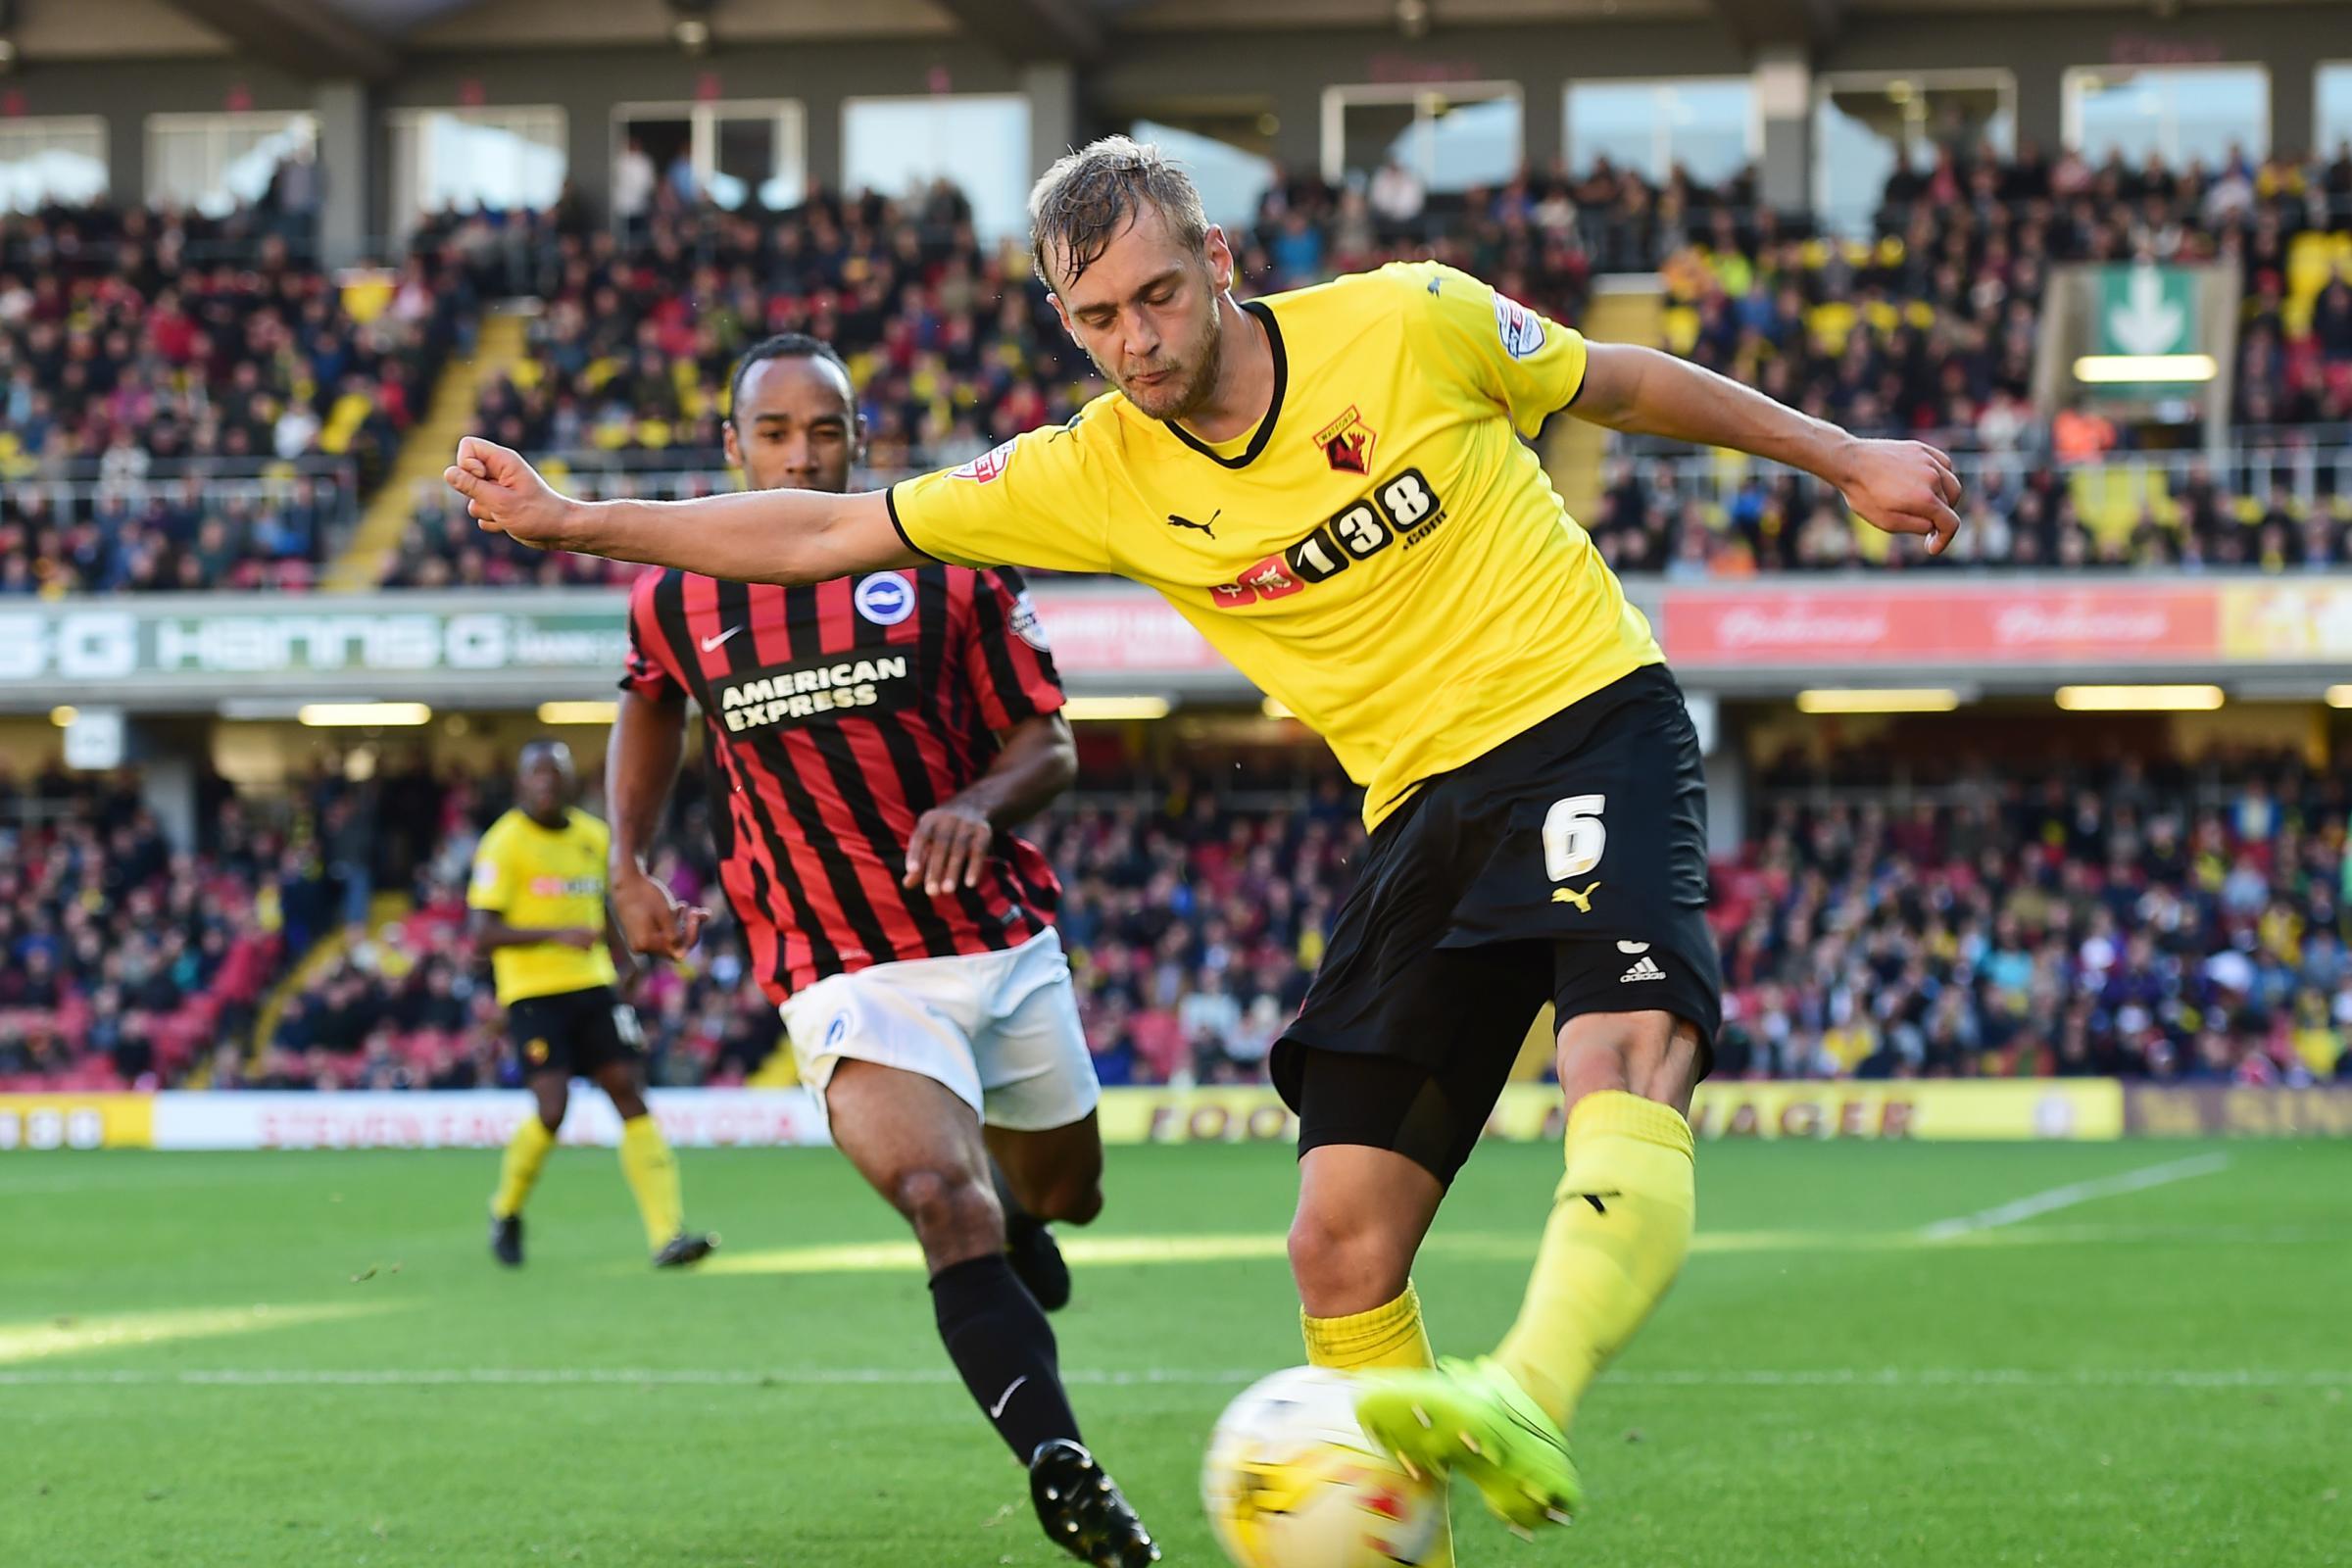 Former Watford defender Joel Ekstrand has retired from football